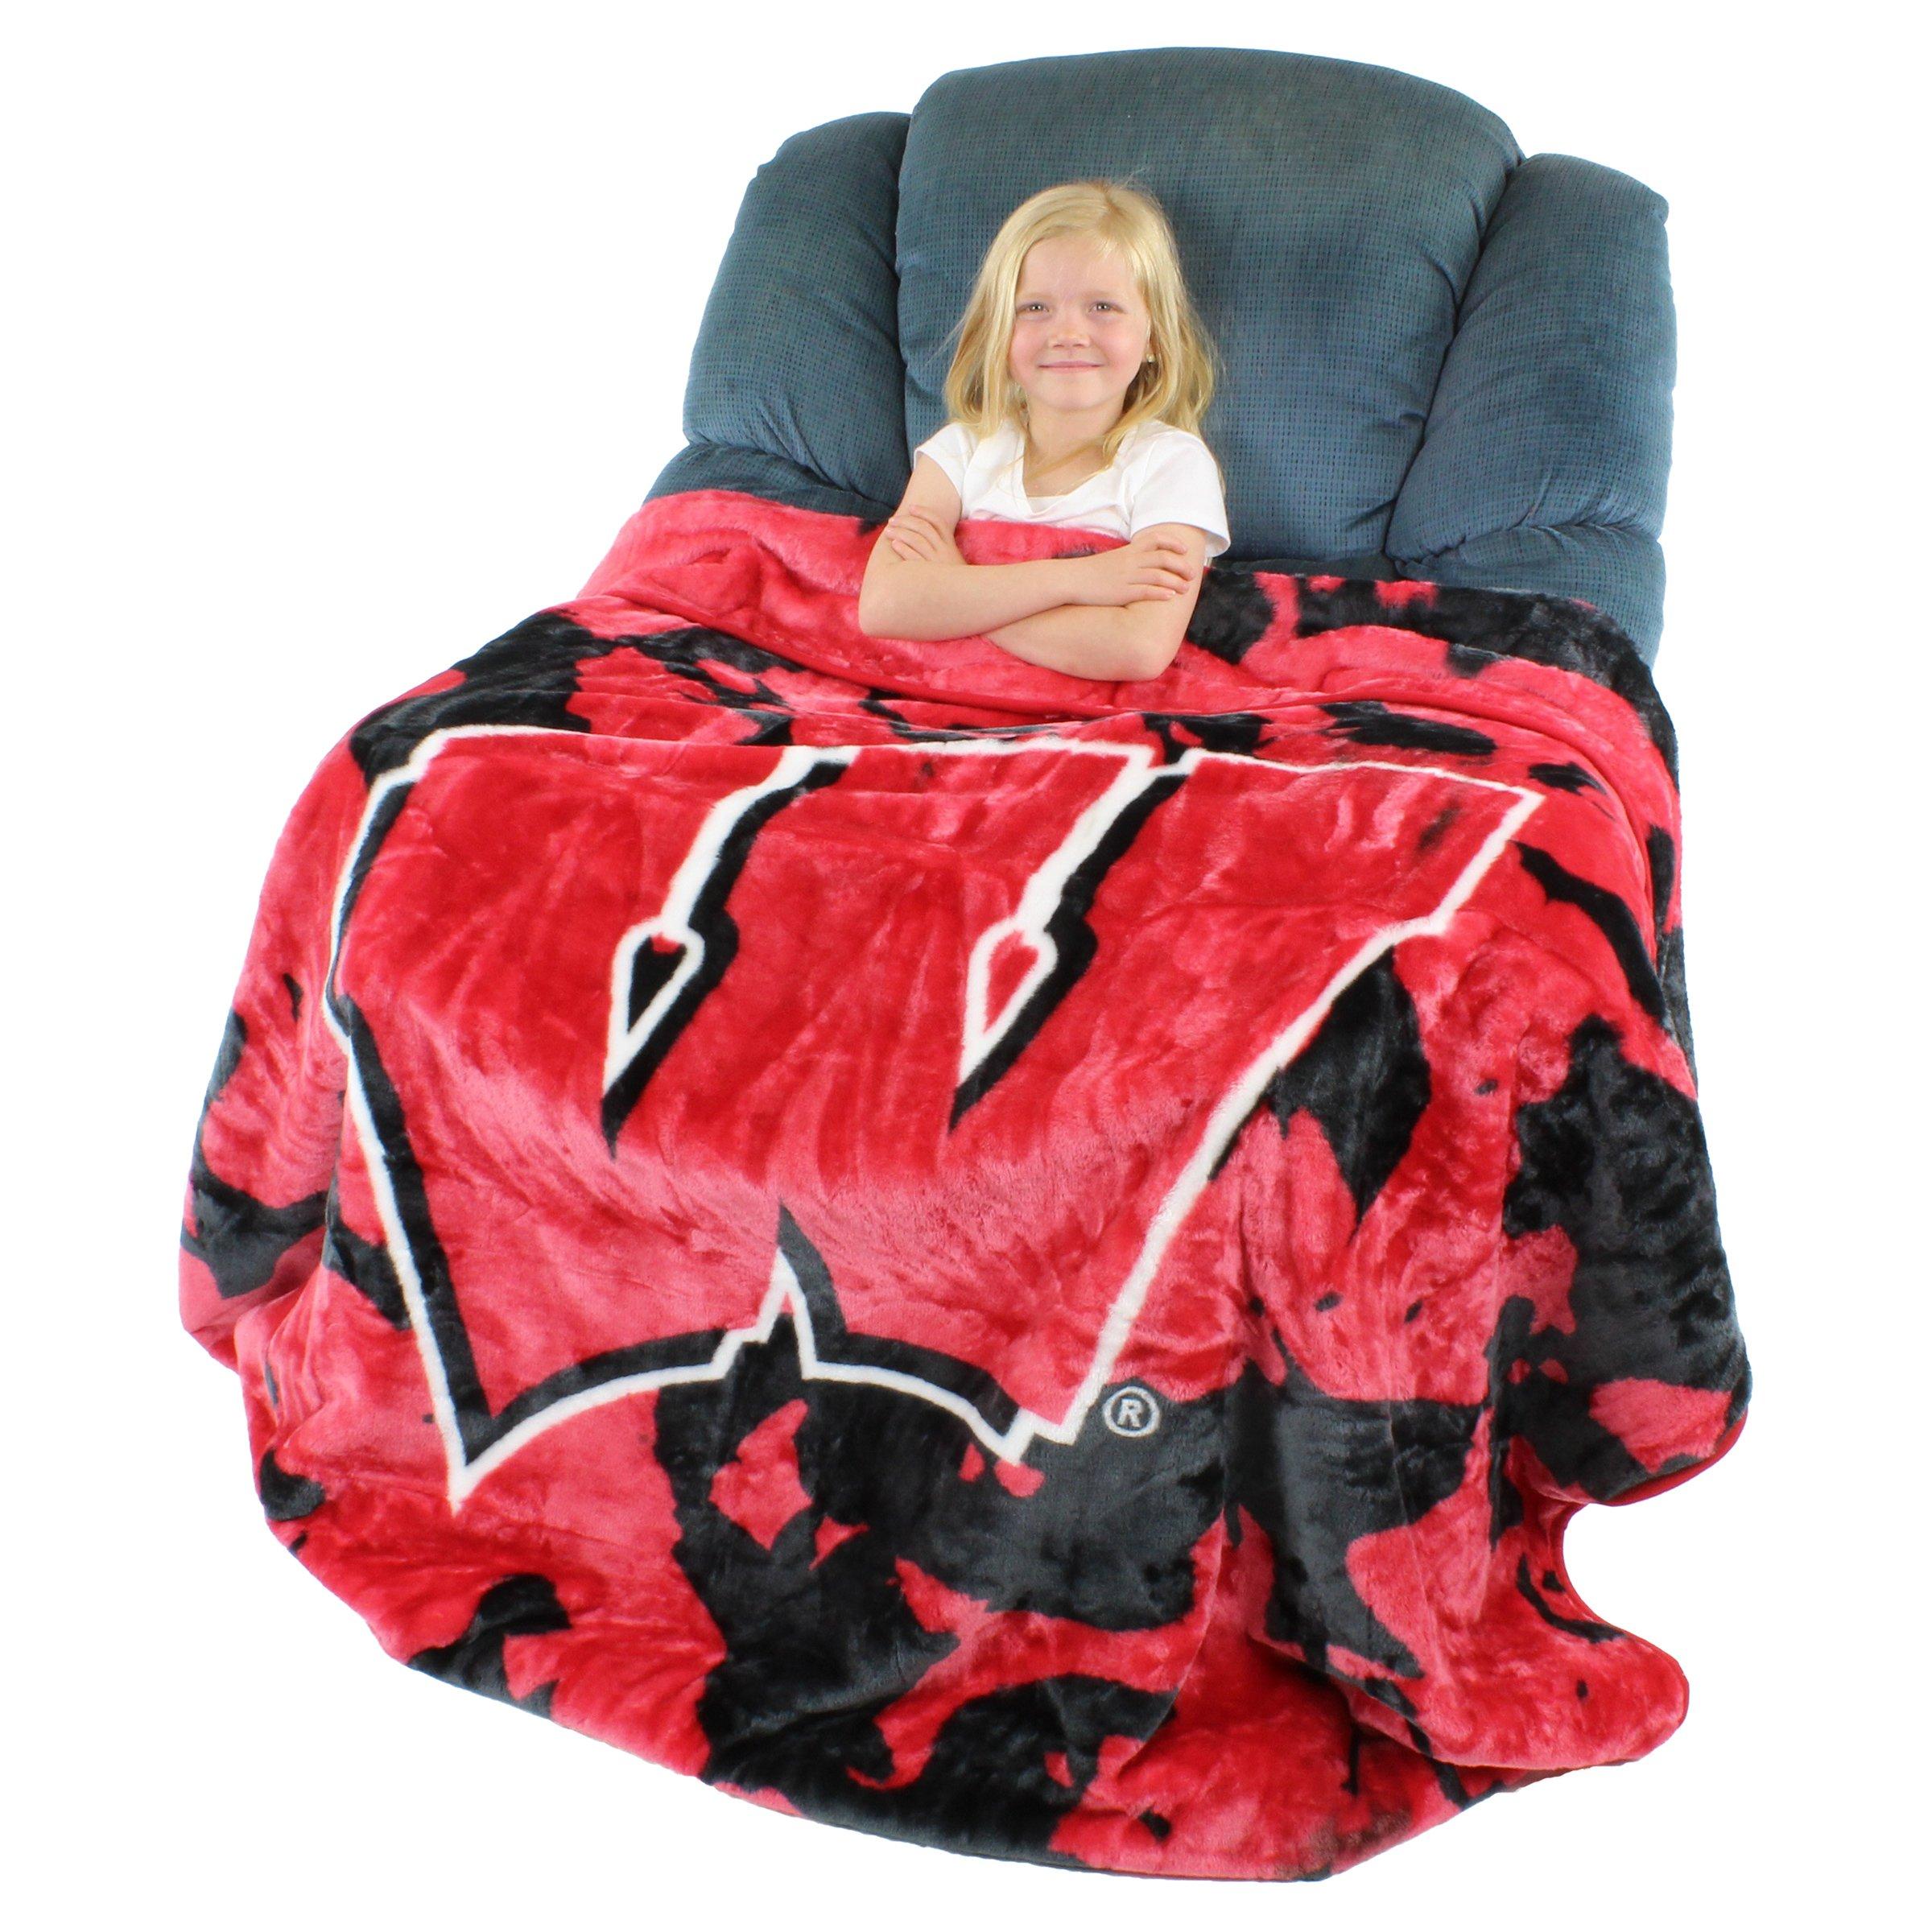 College Covers Wisconsin Badgers Soft Rachel Plush Throw Blanket, 63 x 86''